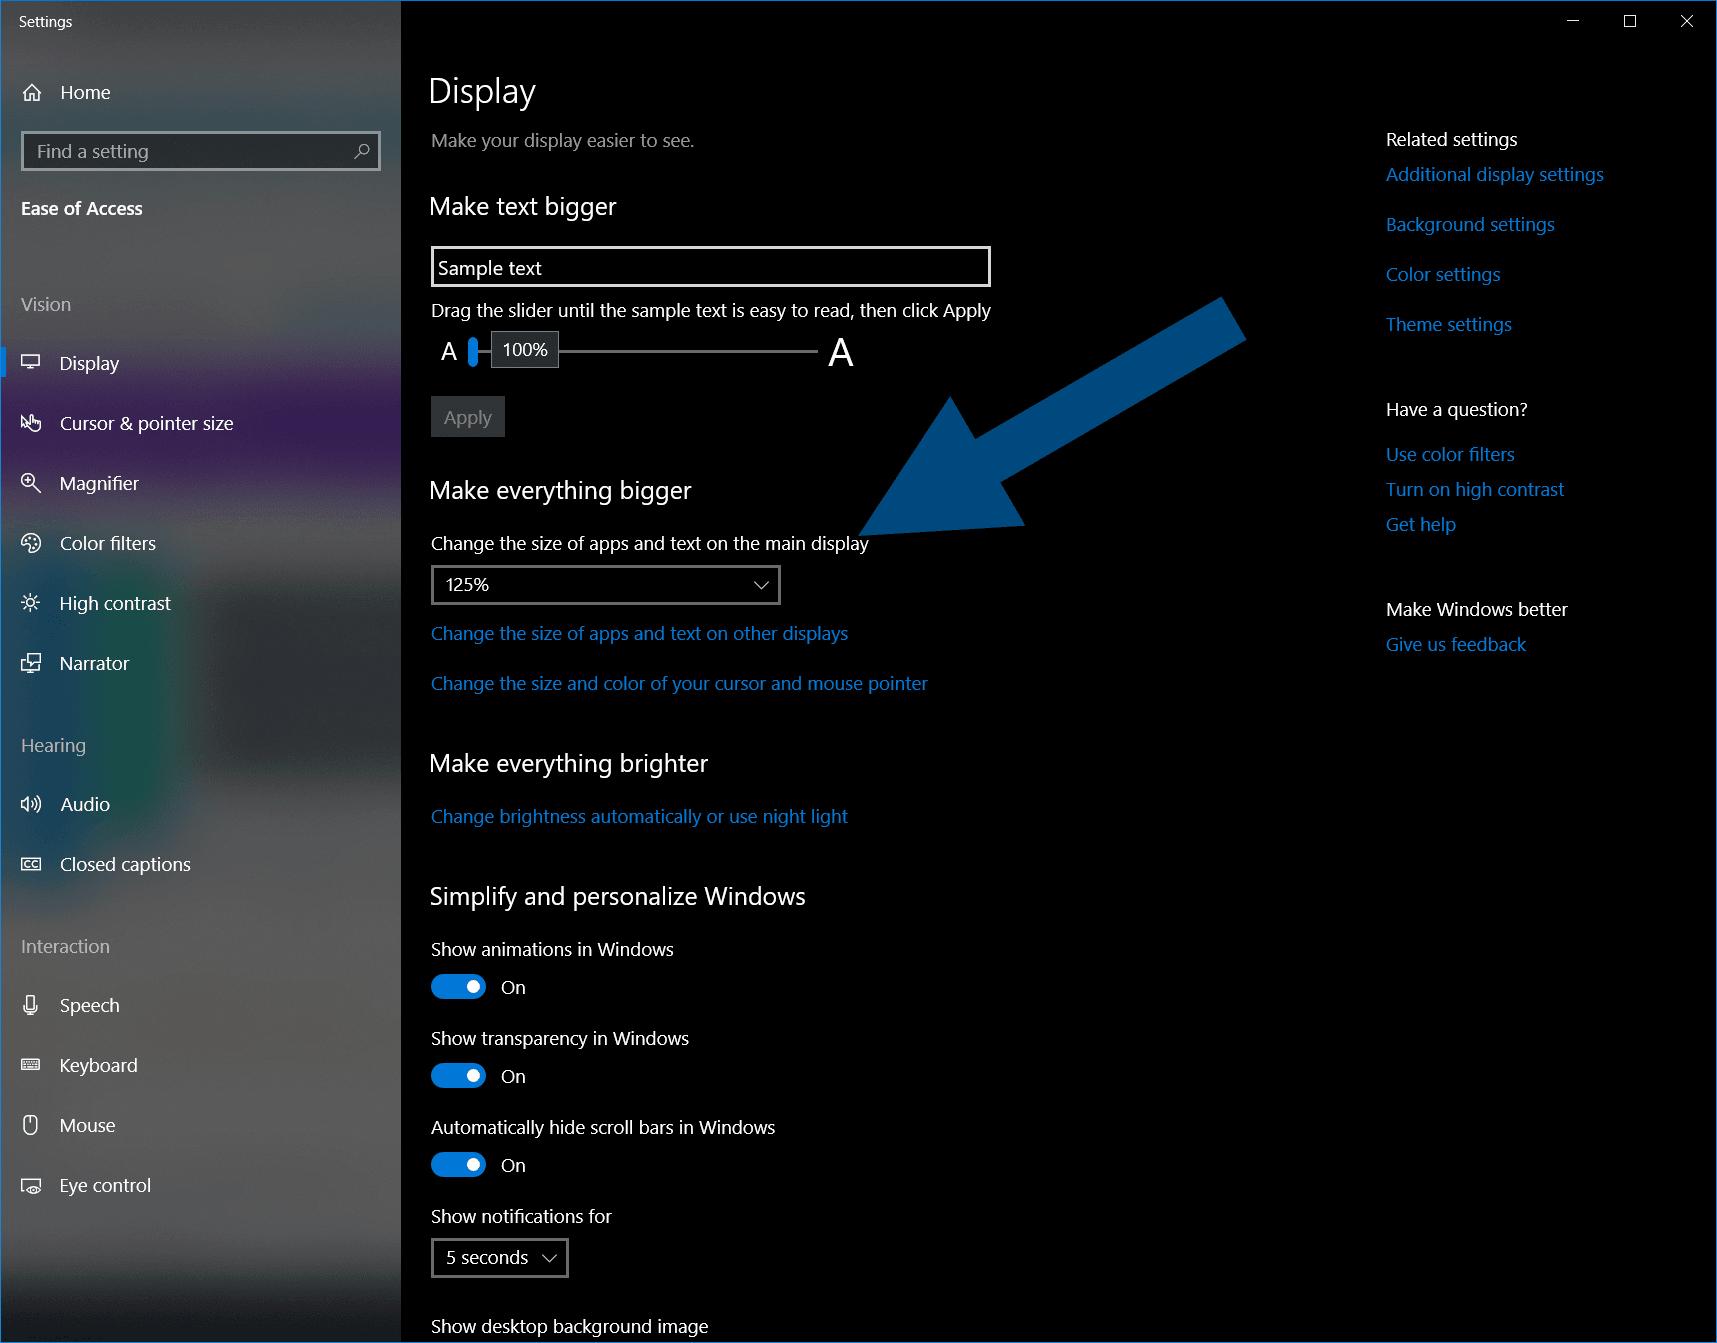 Windows 10 Change Icon Sizes - Make Everything Bigger